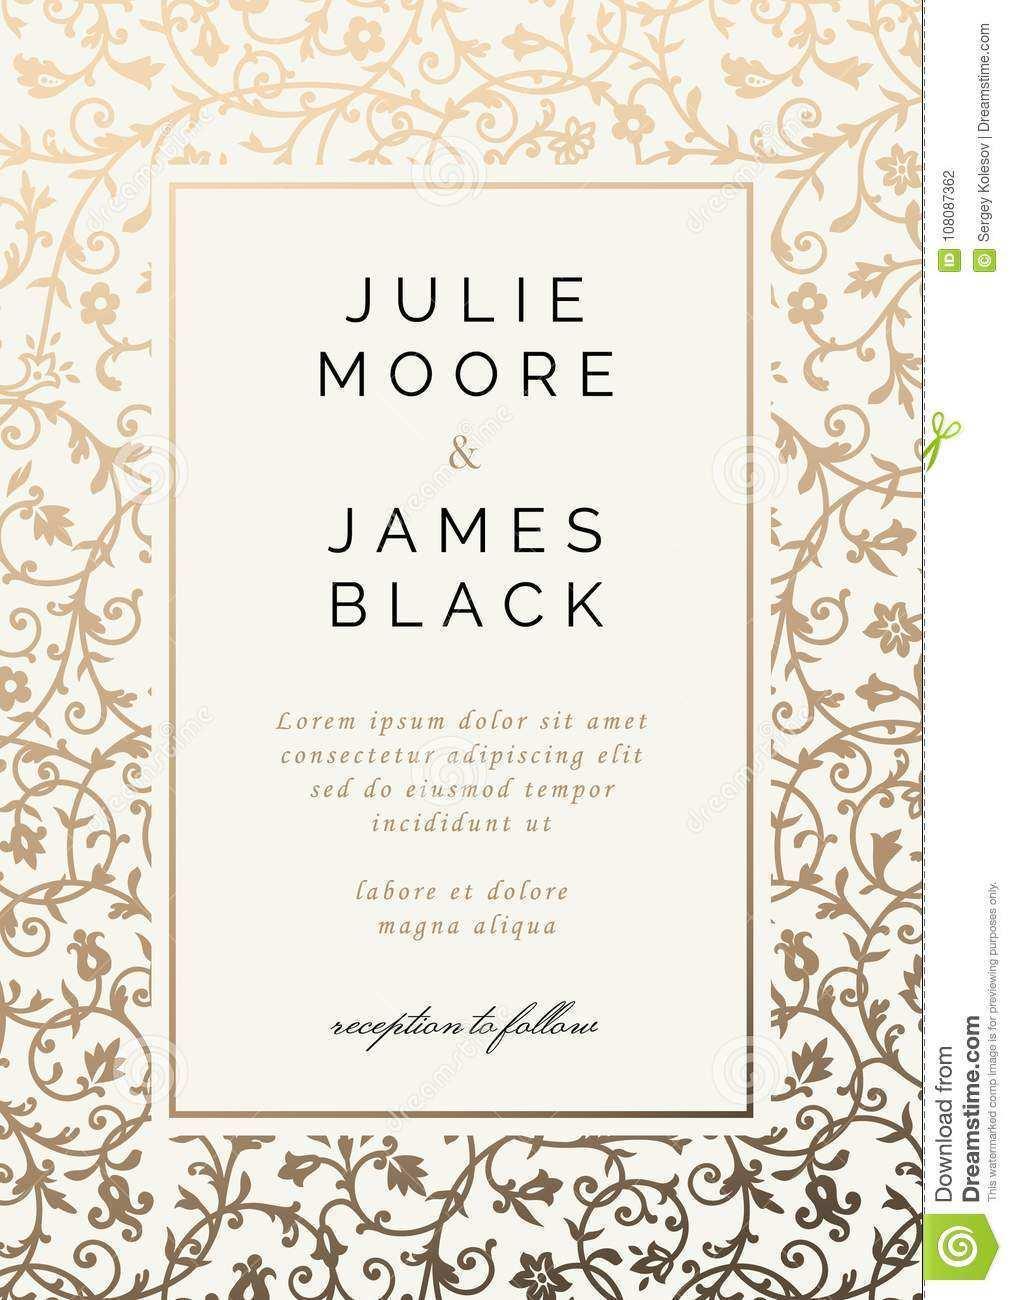 15 Blank Vintage Wedding Invitation Template Free Psd File By Vintage Wedding Invitation Template Free Cards Design Templates